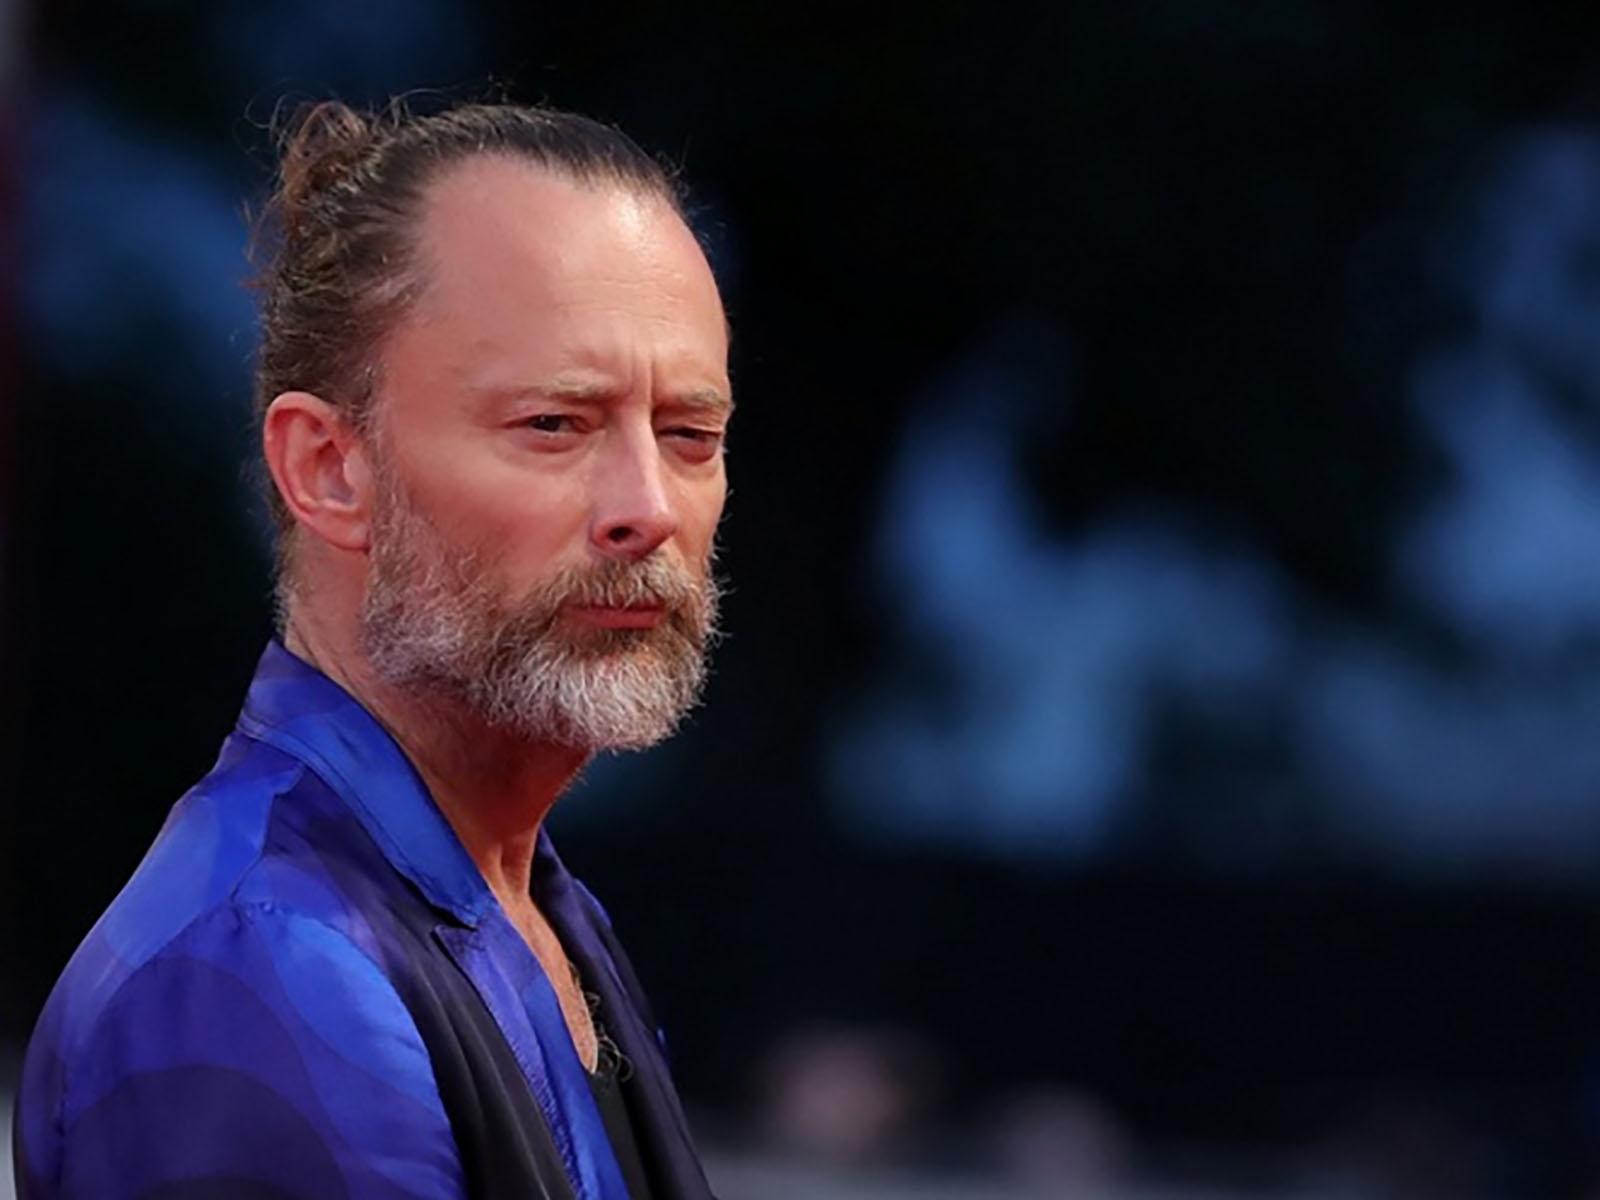 Thom Yorke no irá a la ceremonia del Rock & Roll Hall of Fame